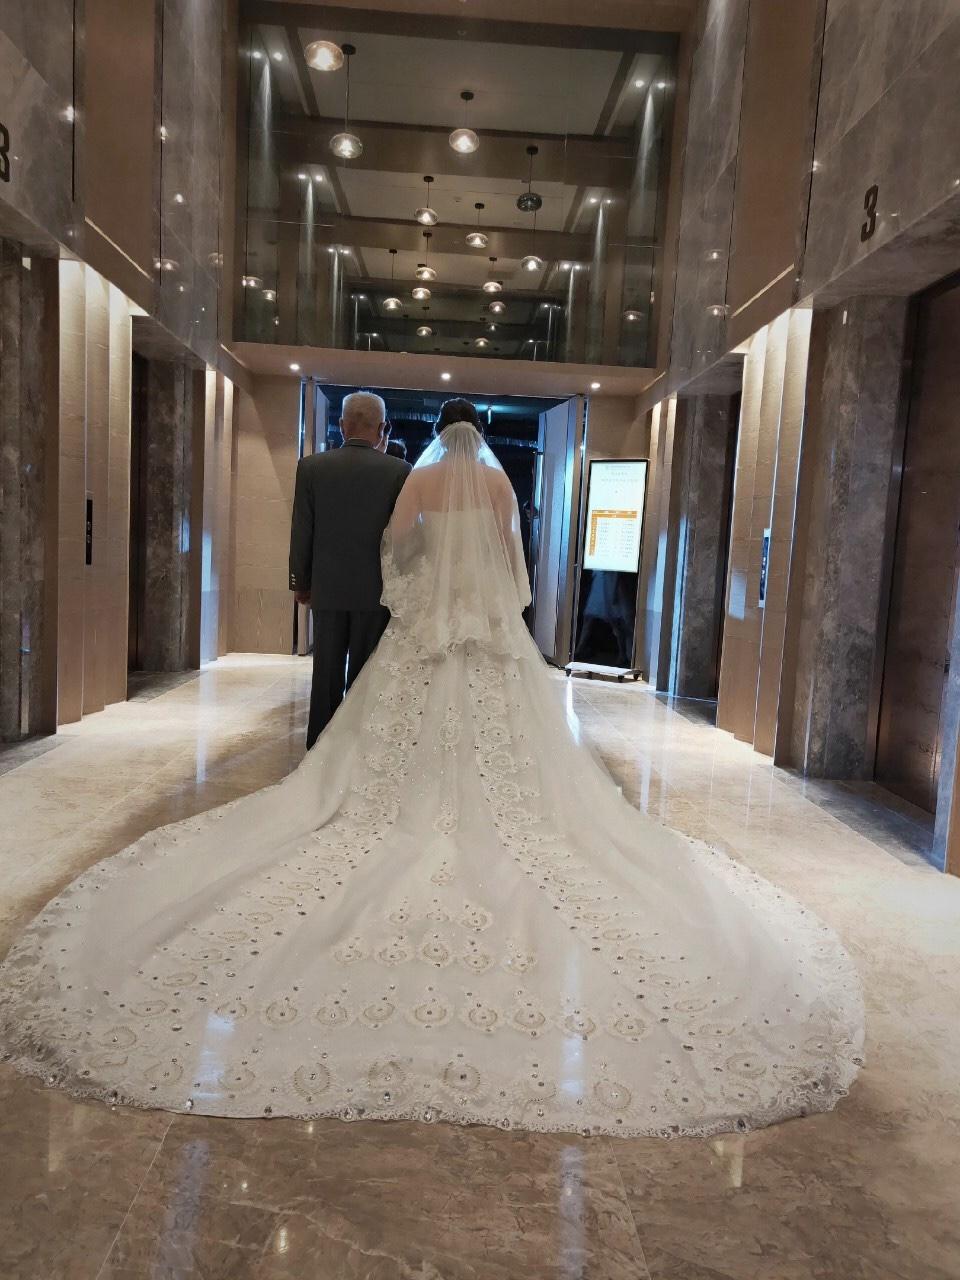 Ephone婚禮企劃團隊,完美的婚禮